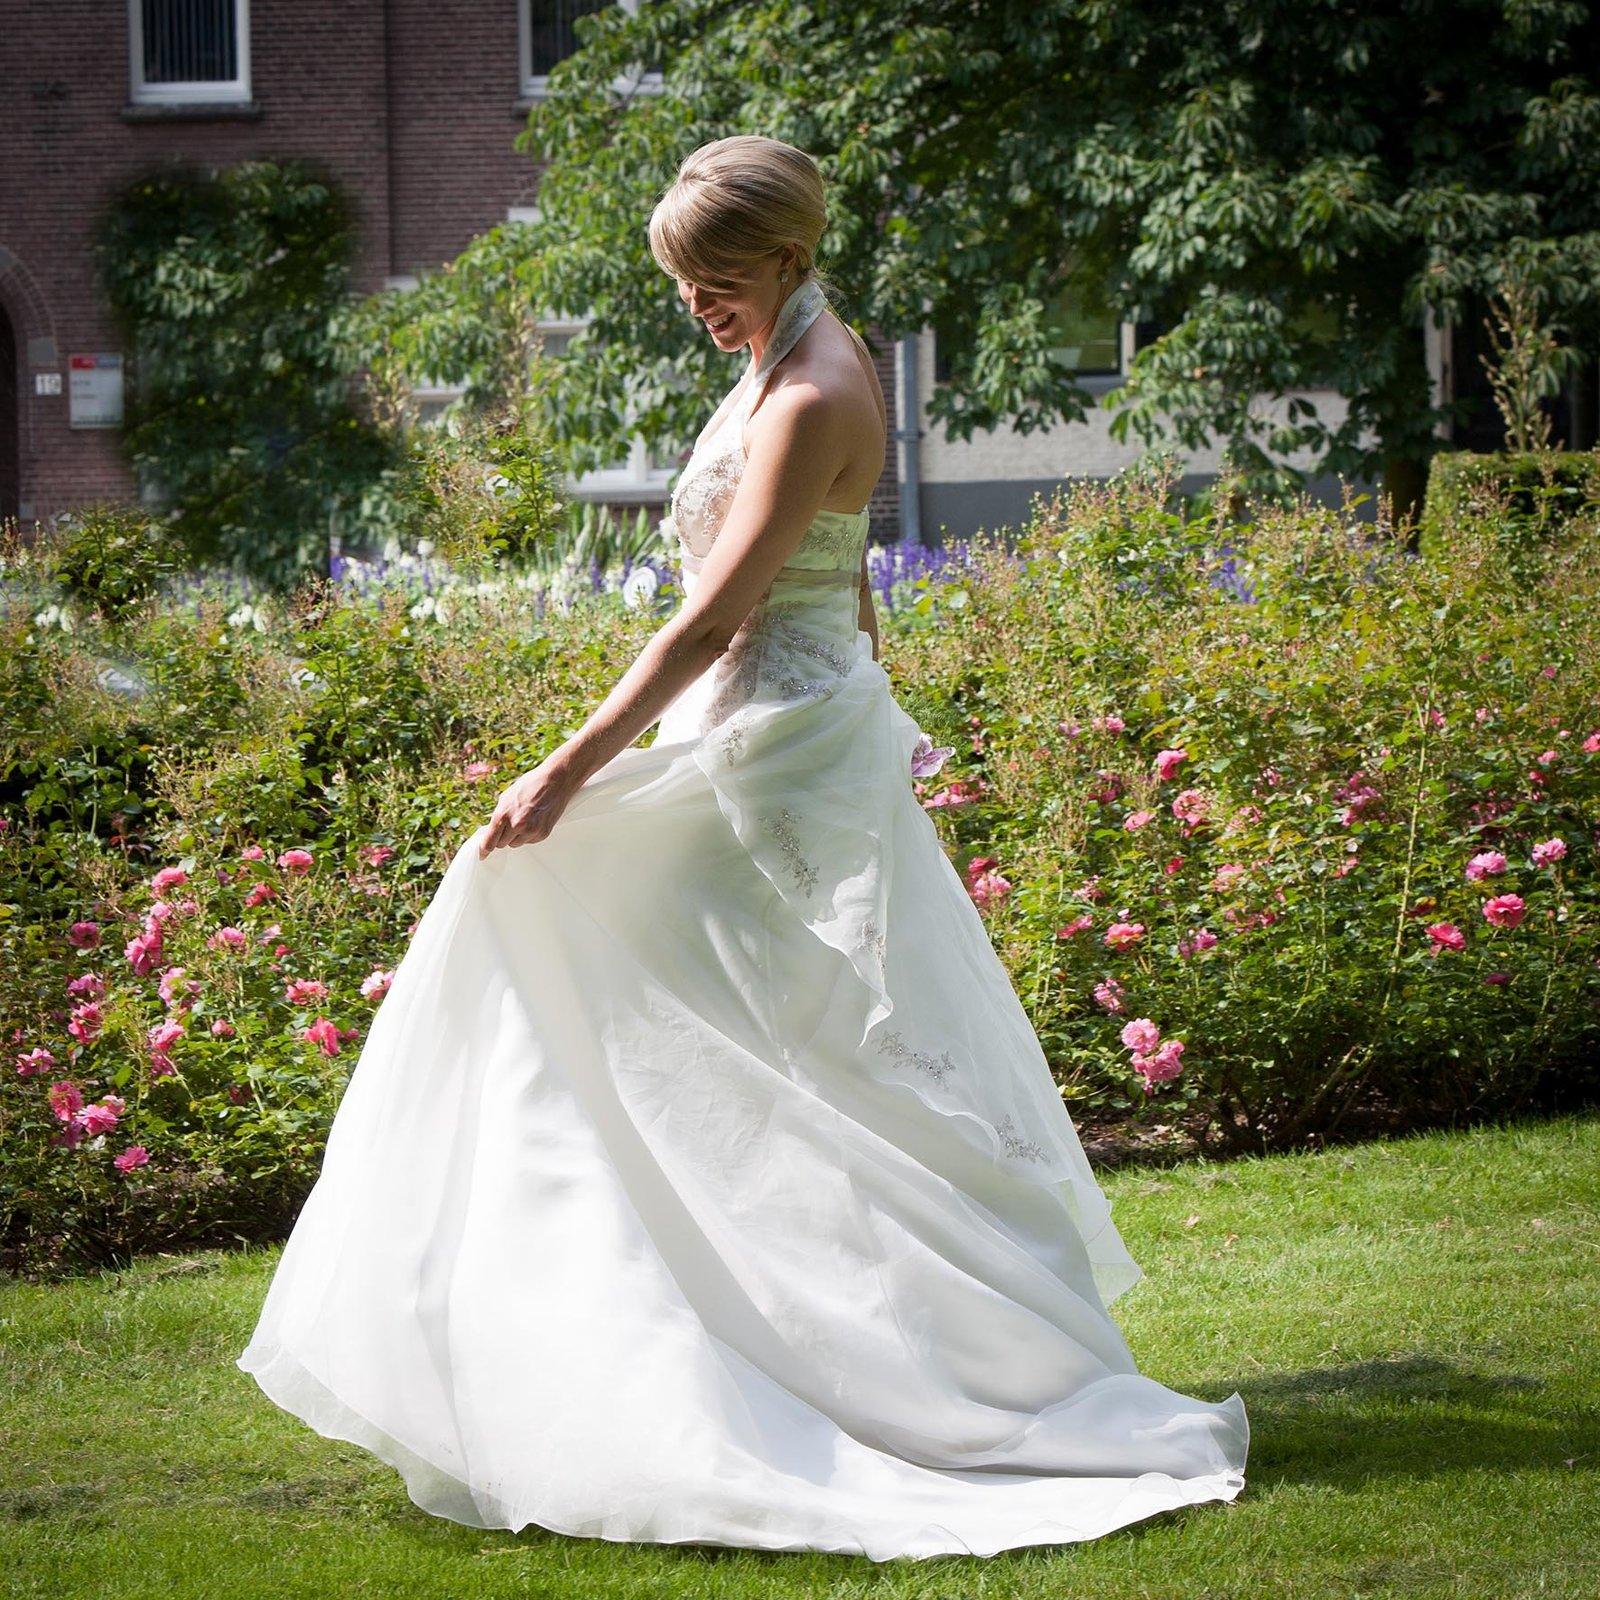 bruidsfotos-grabb-14